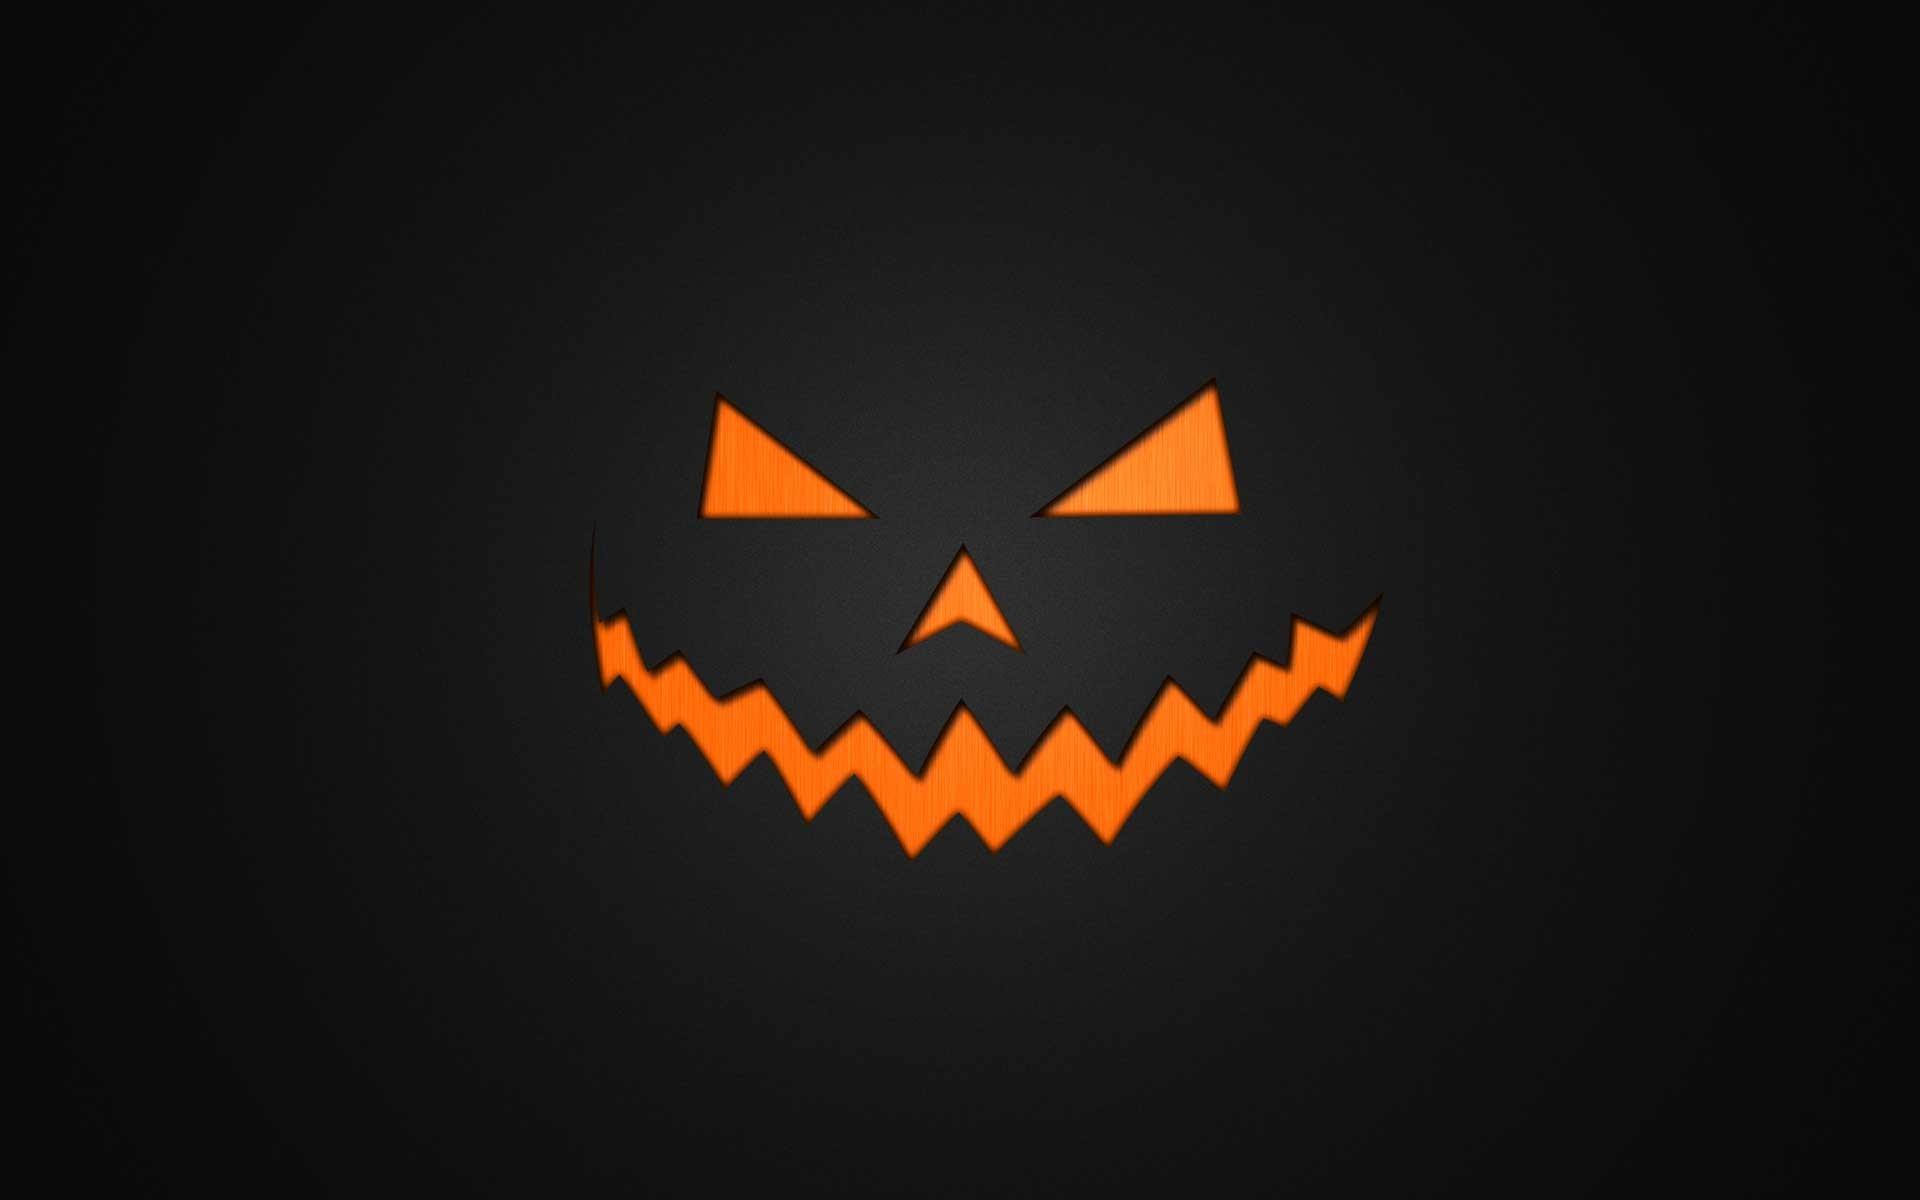 Wallpapers of Halloween 76 images 1920x1200